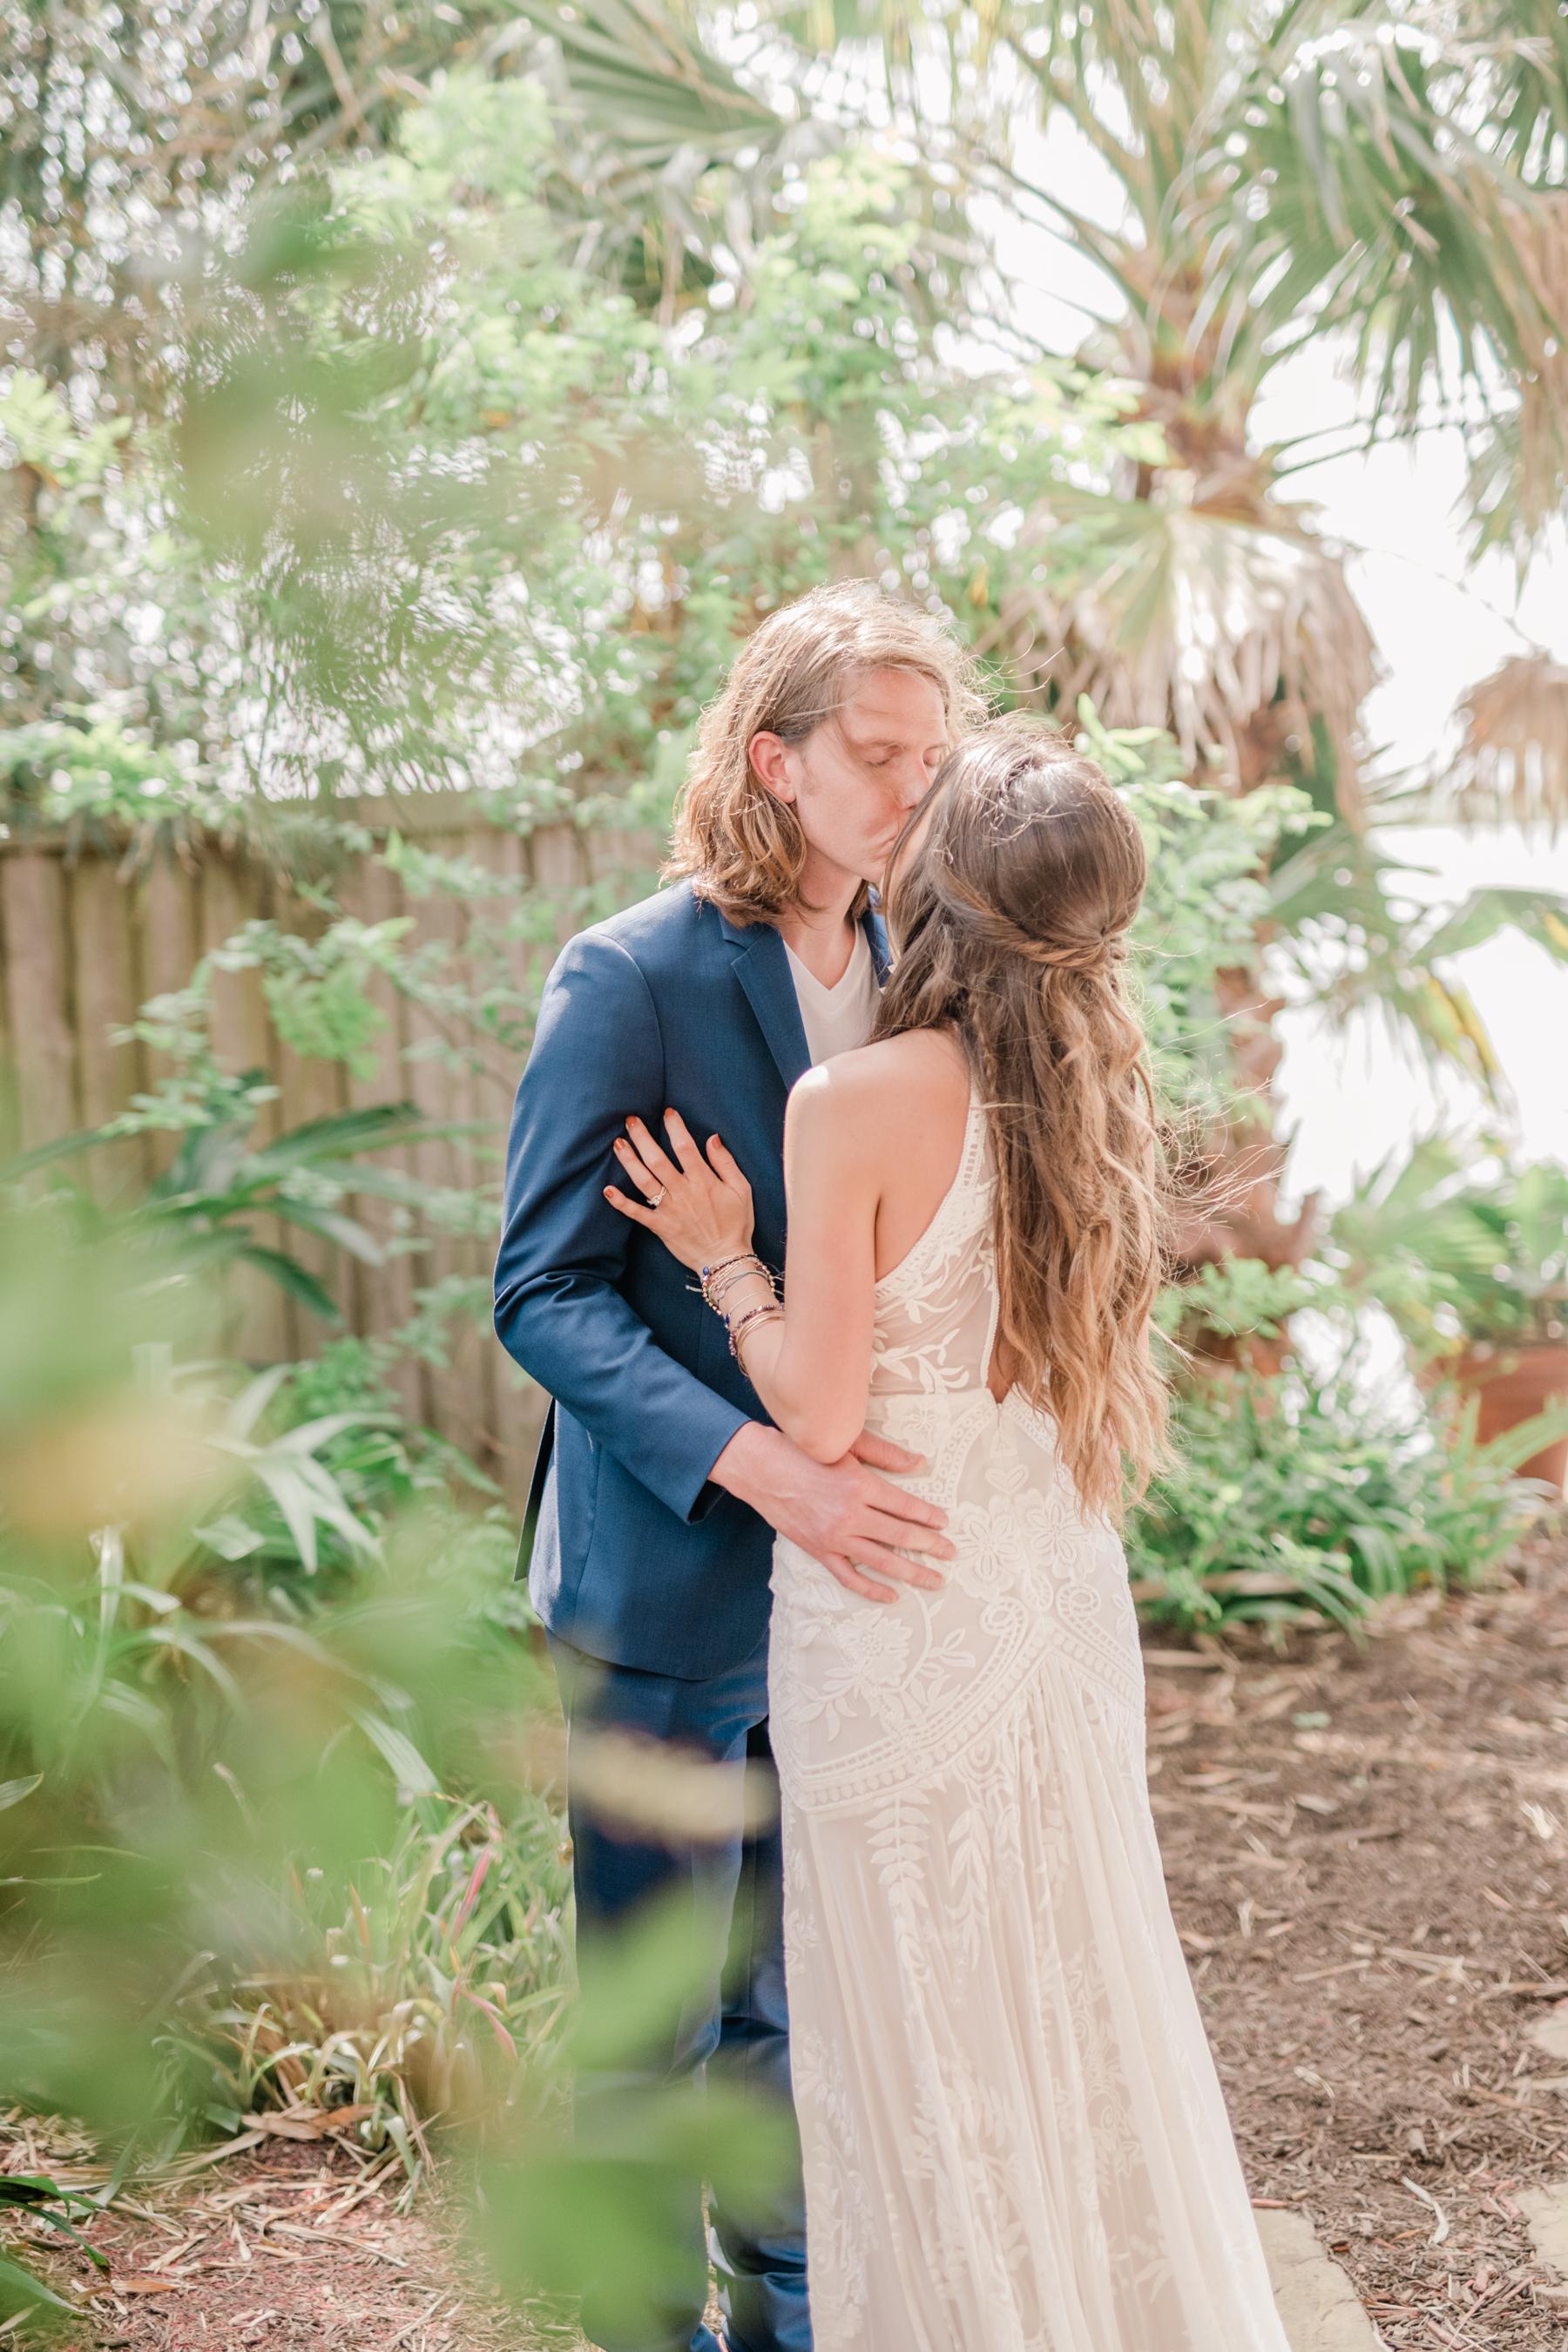 First look with groom wedding day beach galveston blue groom suit no tie inspiration + destination planner coordinator epoch co + ten23 photography